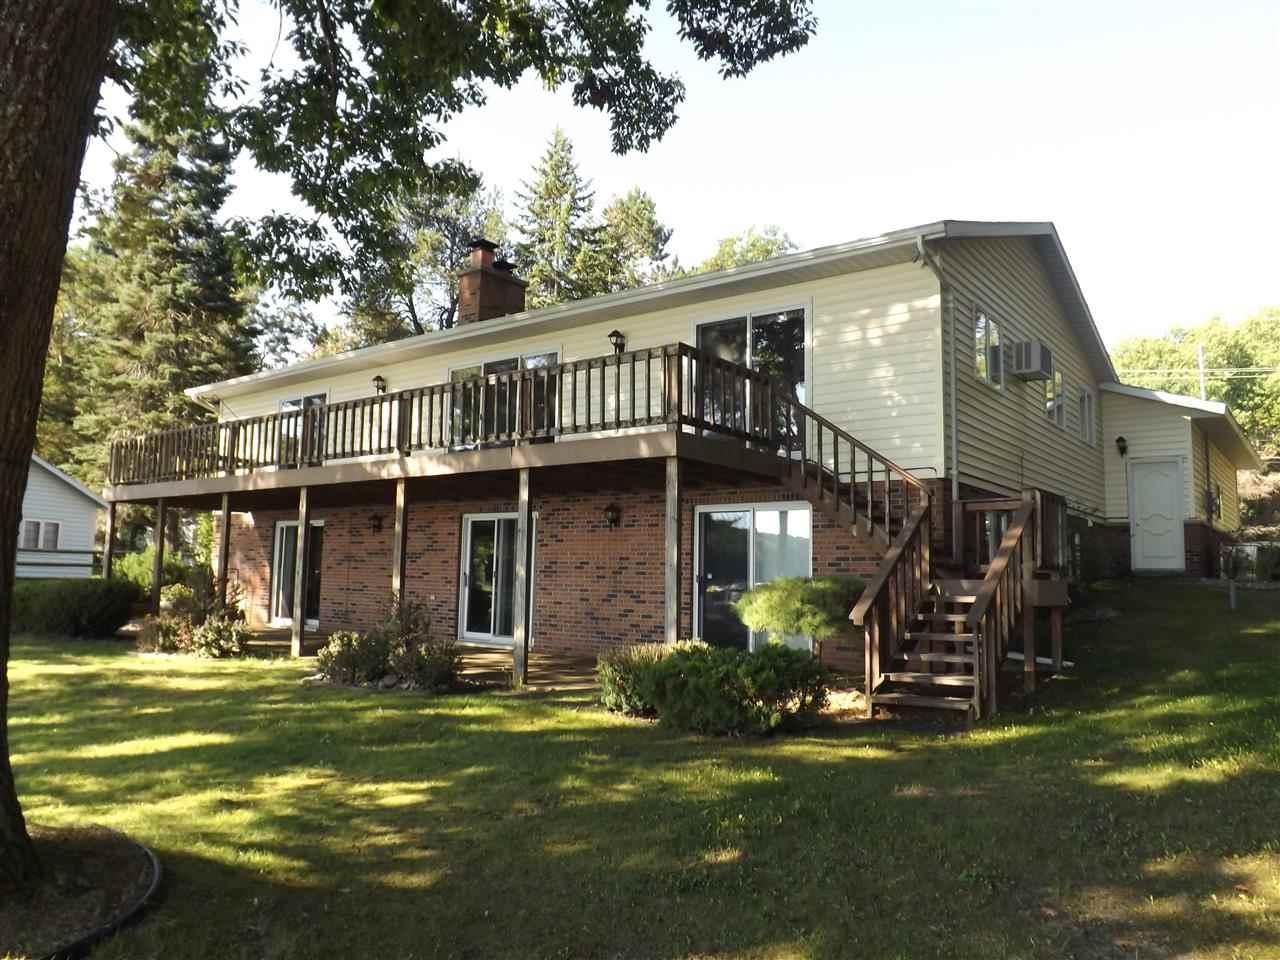 Real Estate for Sale, ListingId: 29859337, Higgins Lake,MI48627